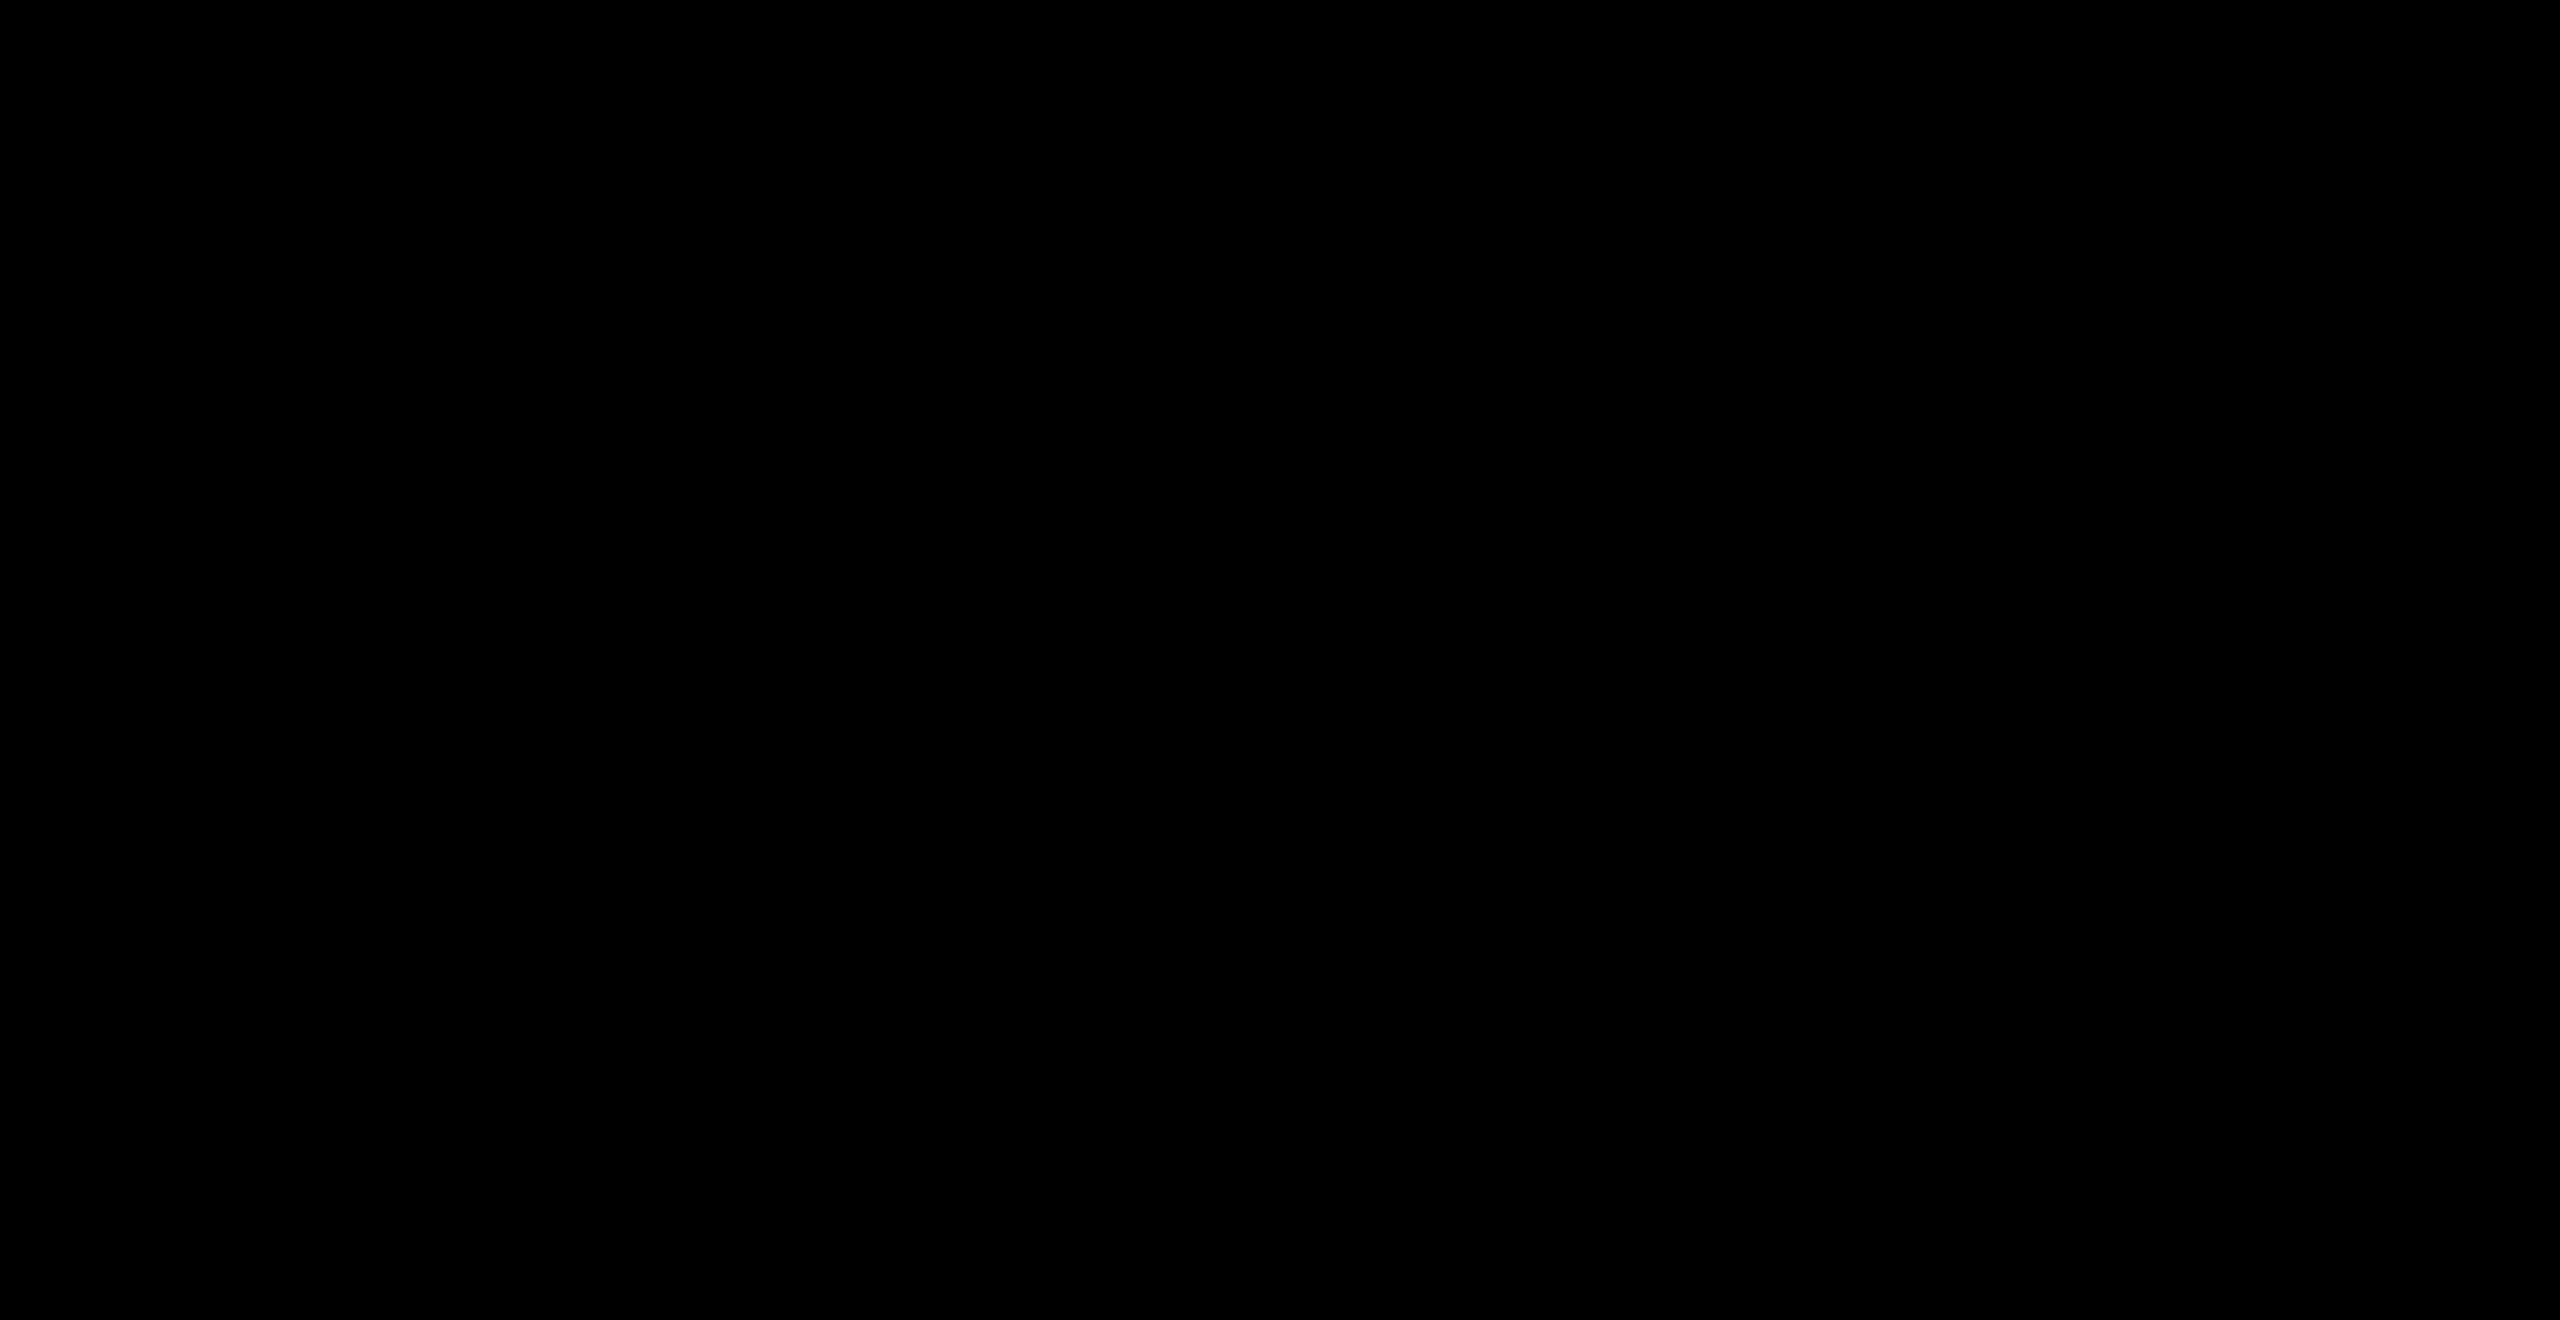 Alexanderplatz 23.05.2021 Microsonidos